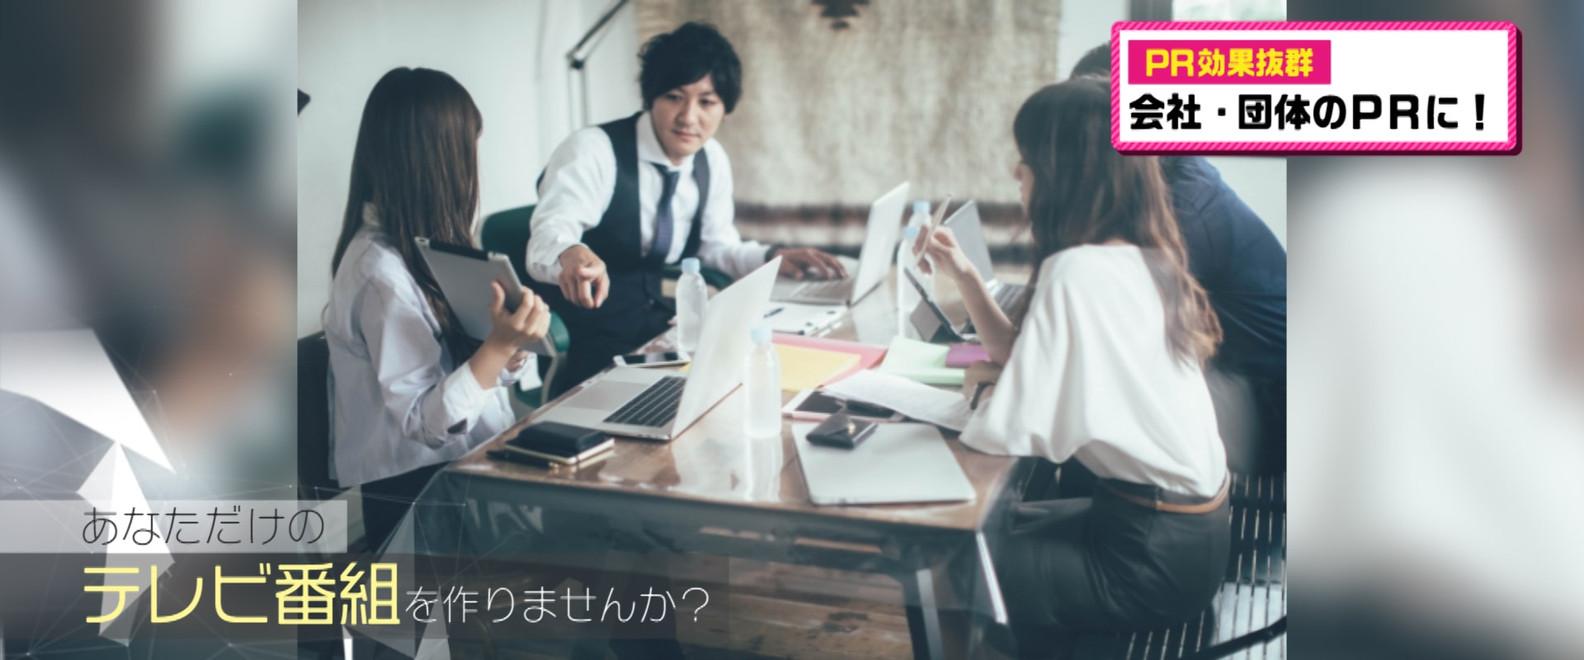 Luvas_サービス_TV (4).jpg